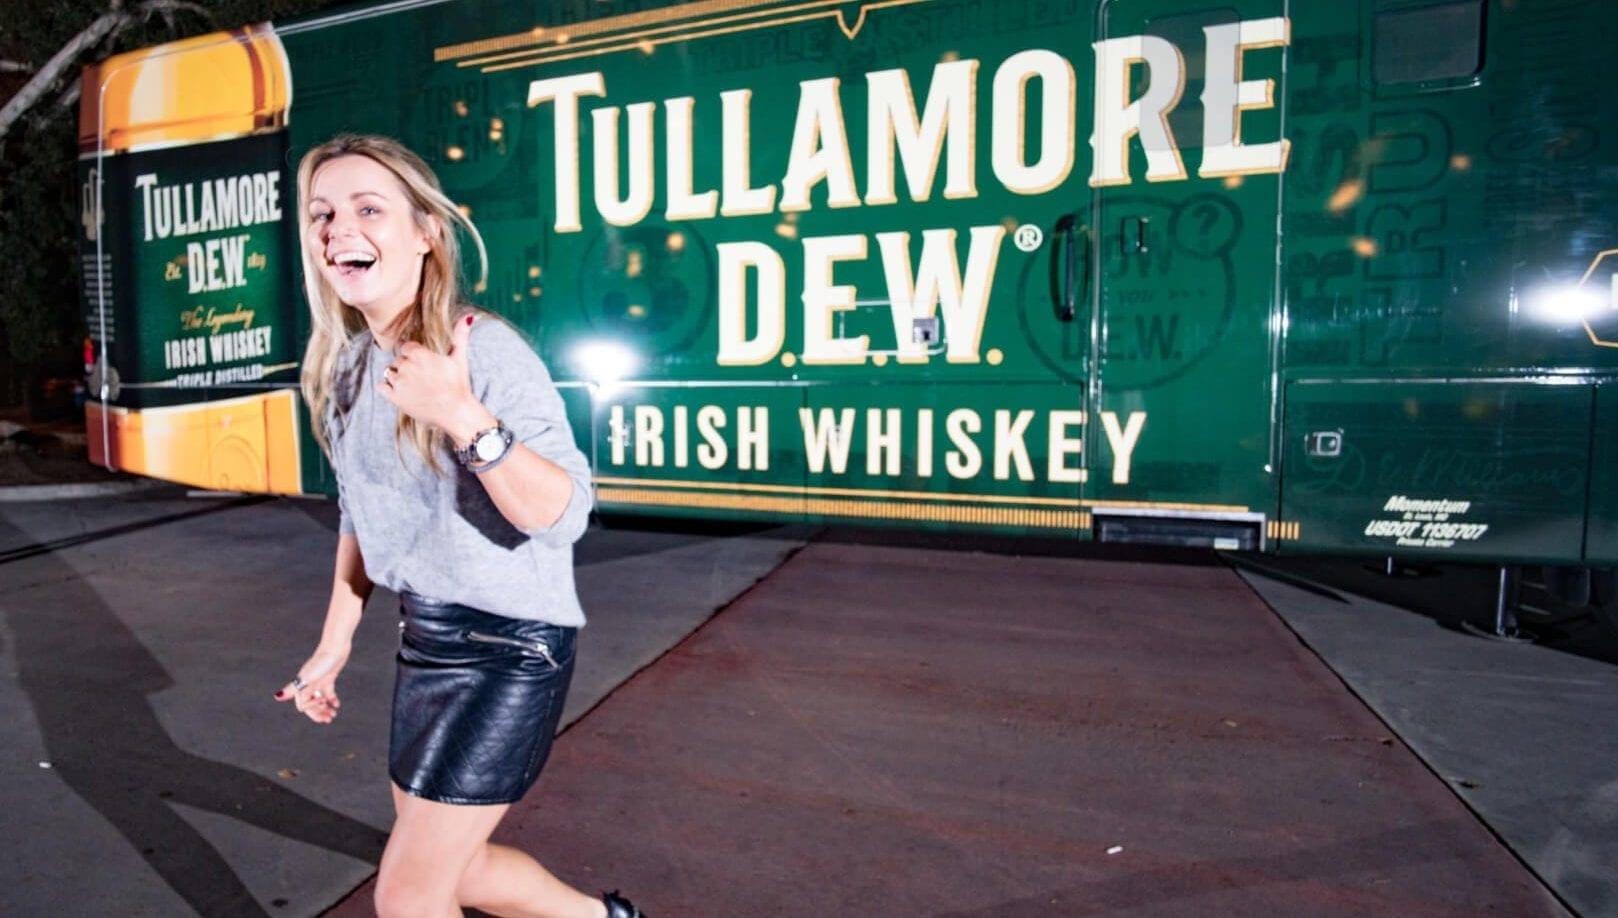 D.E.W. & A Brew Tour - Asbury Park